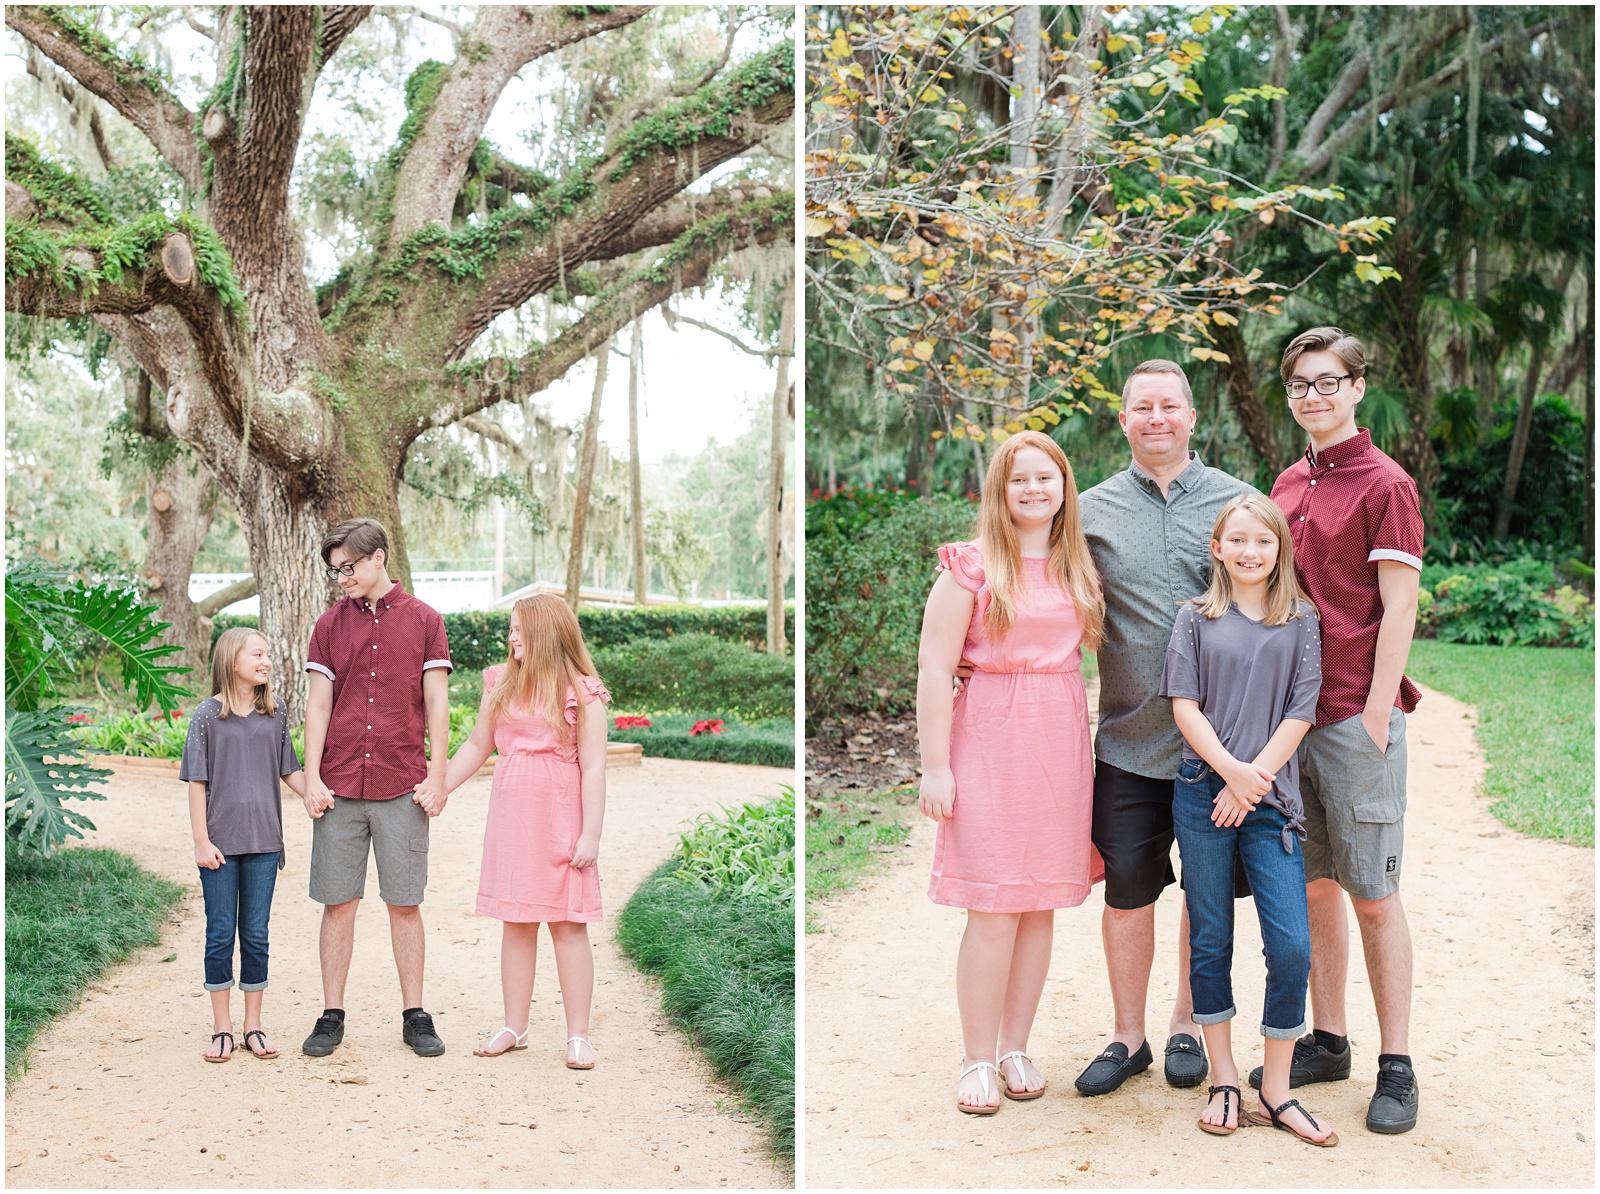 Washington Oaks_Garden_State Park_Beach_Family_Portraits_8.jpg